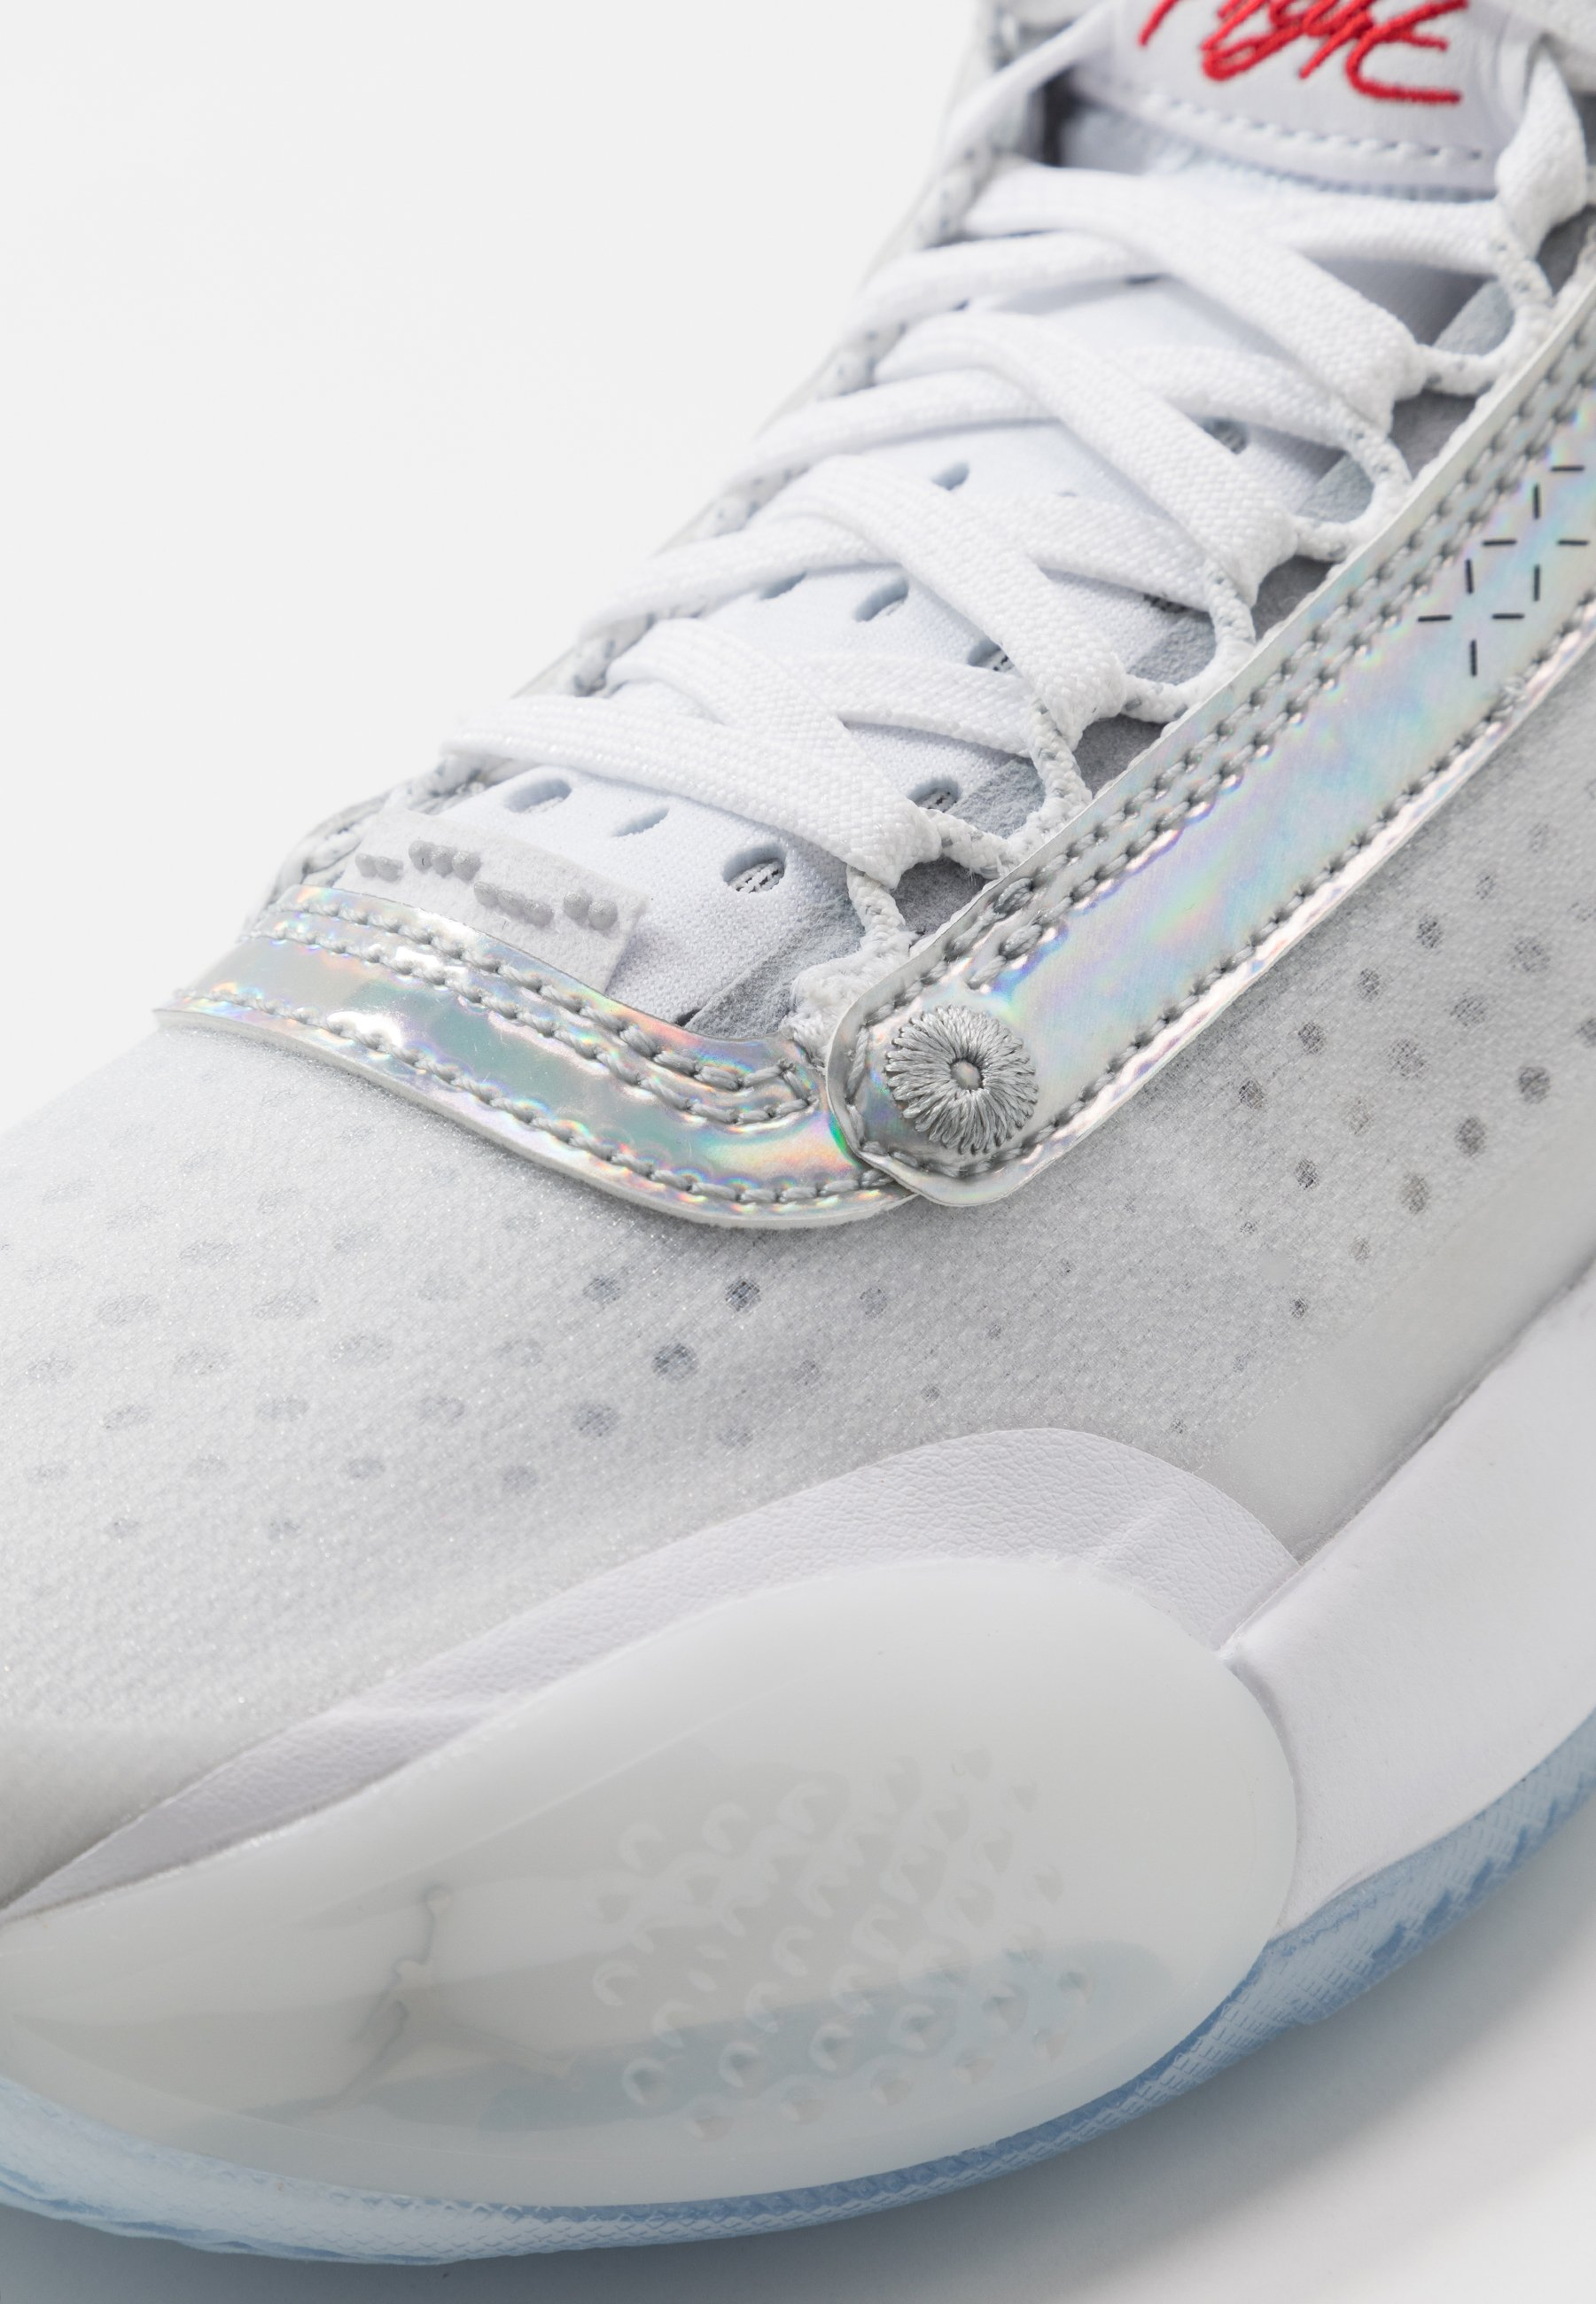 Jordan AIR XXXIV BG Basketballsko whitemetallic silver